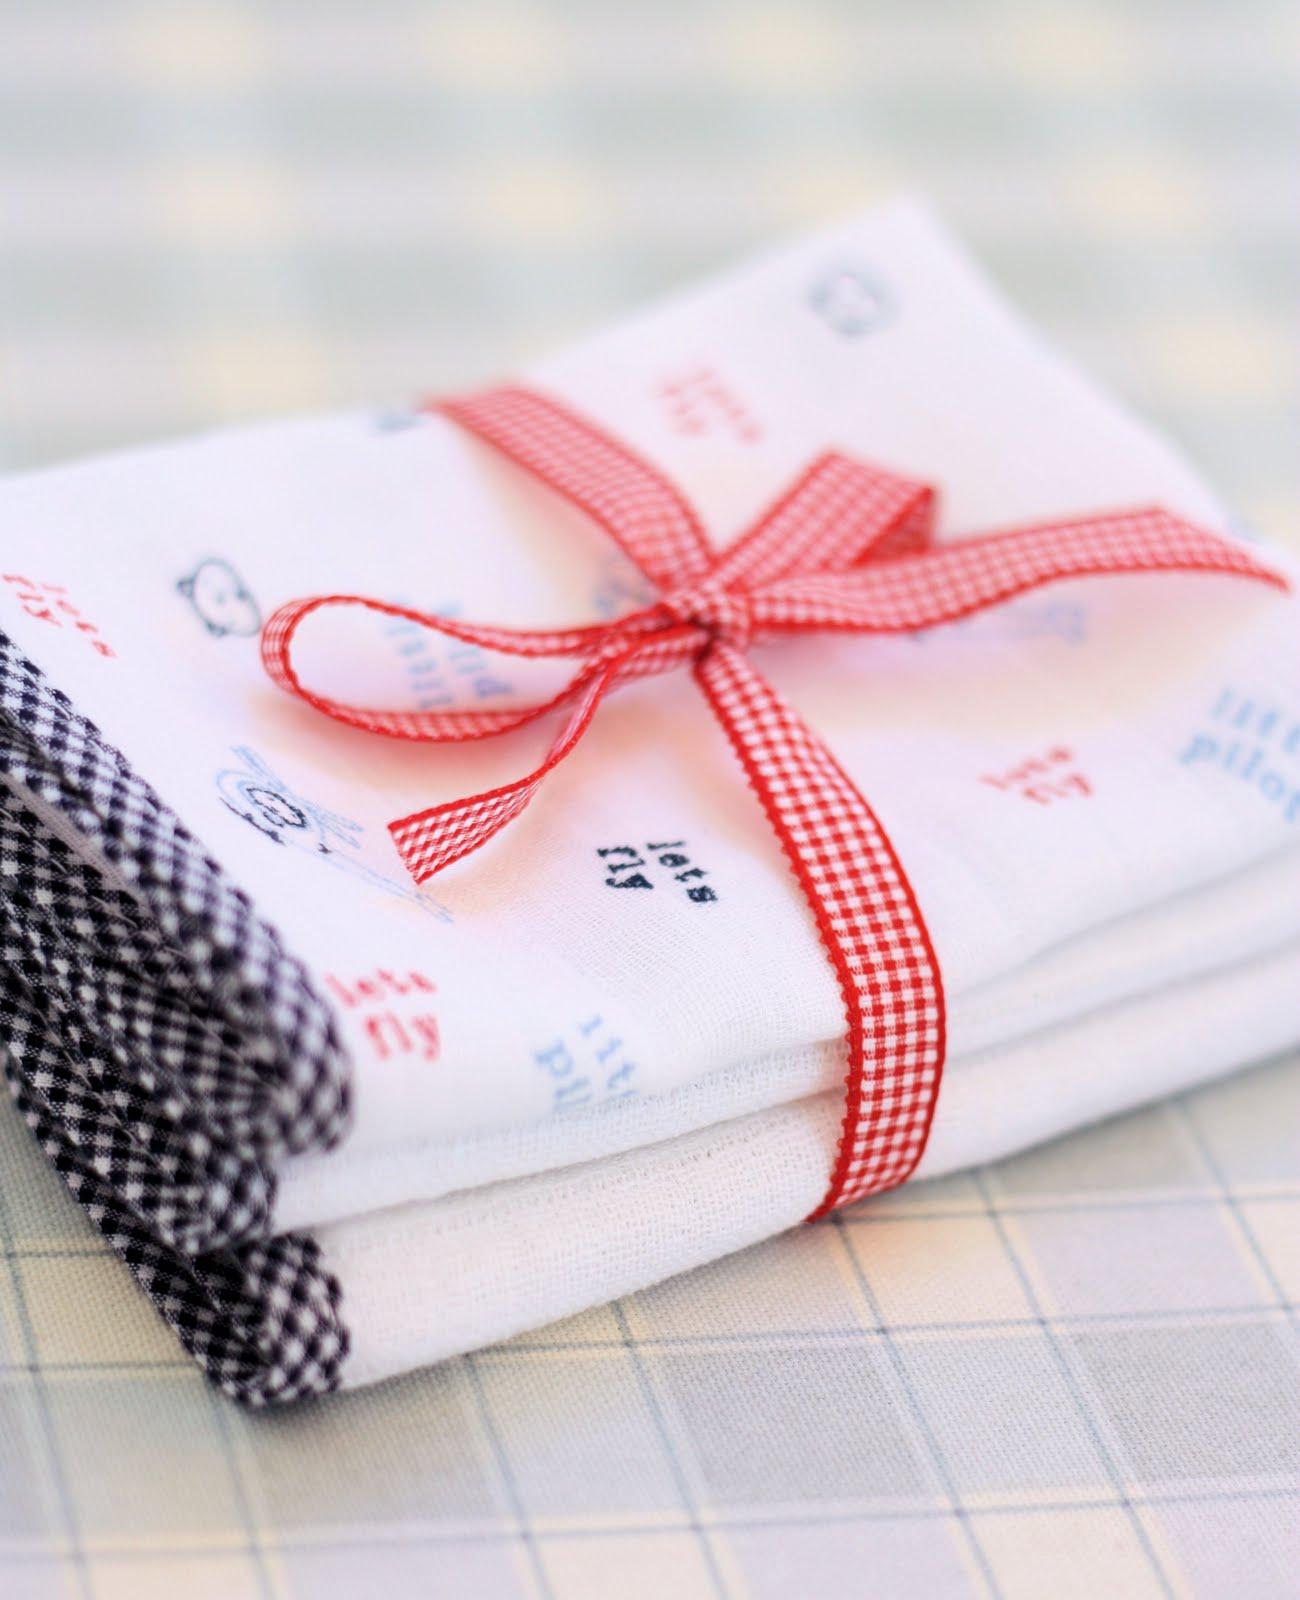 Wash Cloths As Burp Cloths: A Spoonful Of Sugar